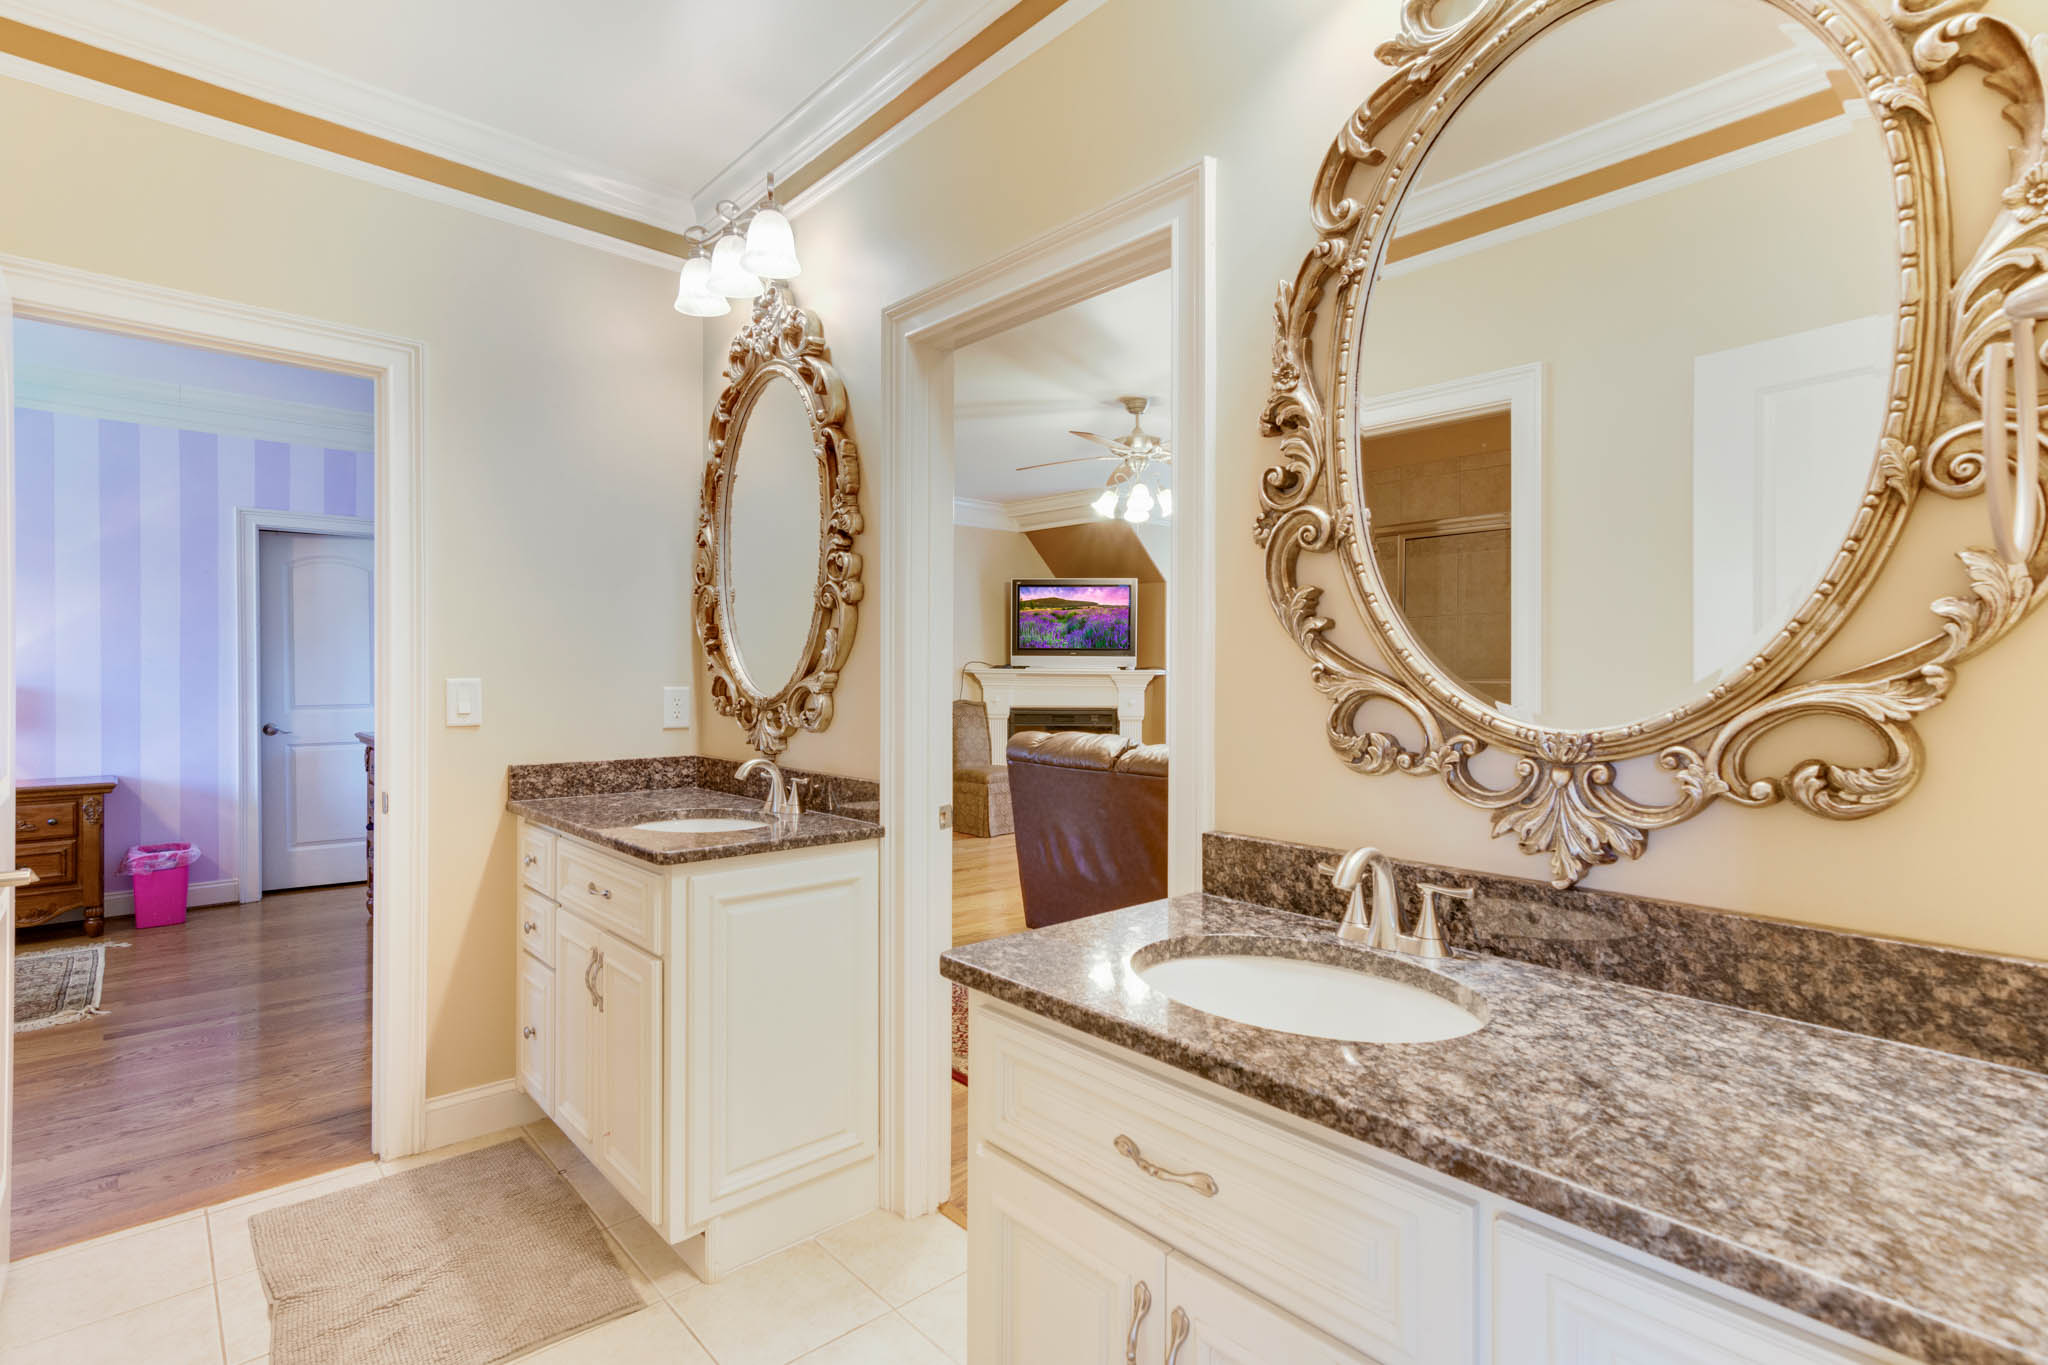 real_estate_photographer_bathroom_photography-5.jpg